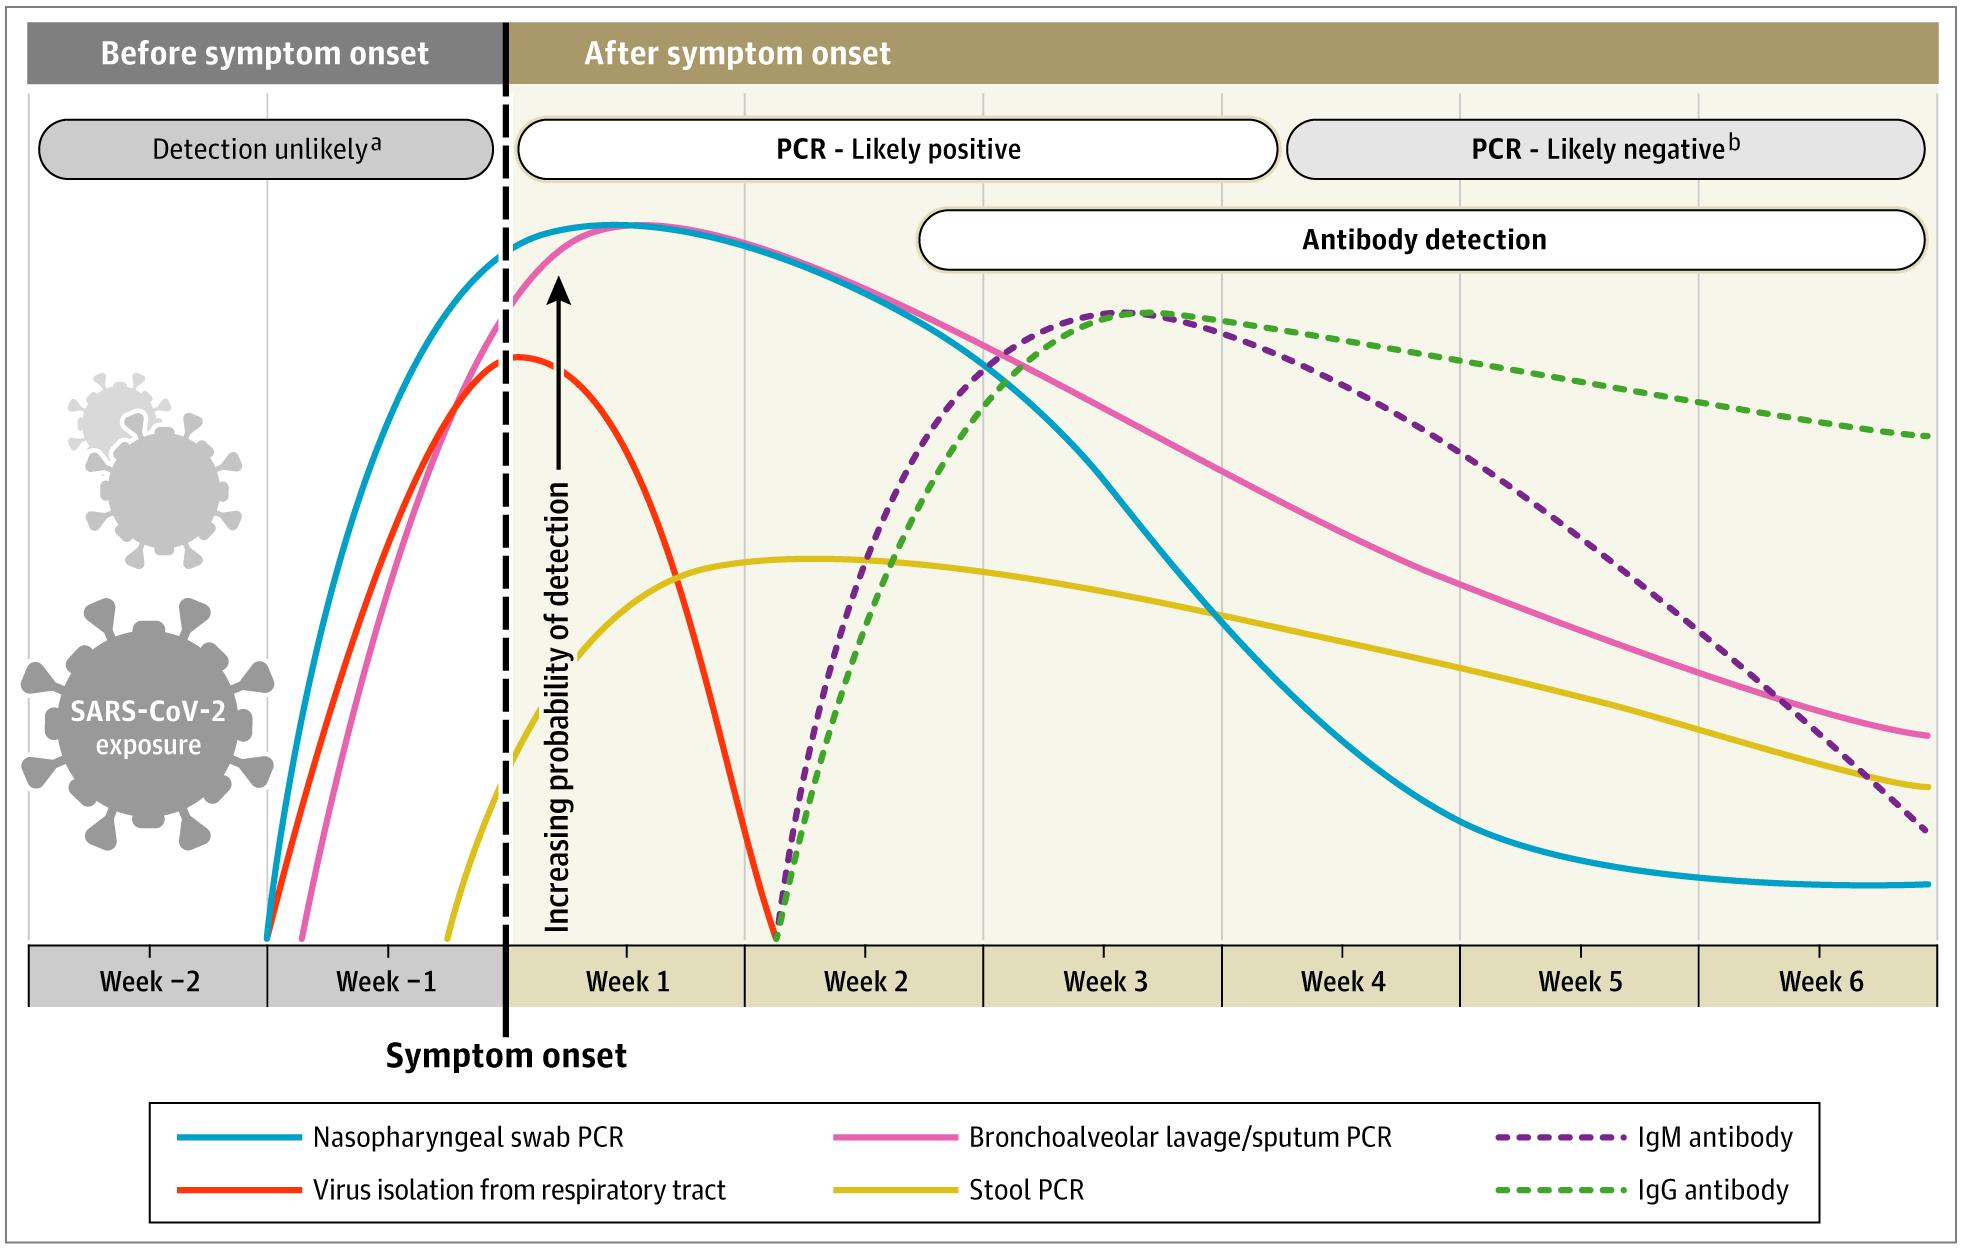 Interpreting diagnostic tests. — Courtesy: https://jamanetwork.com/journals/jama/fullarticle/2765837